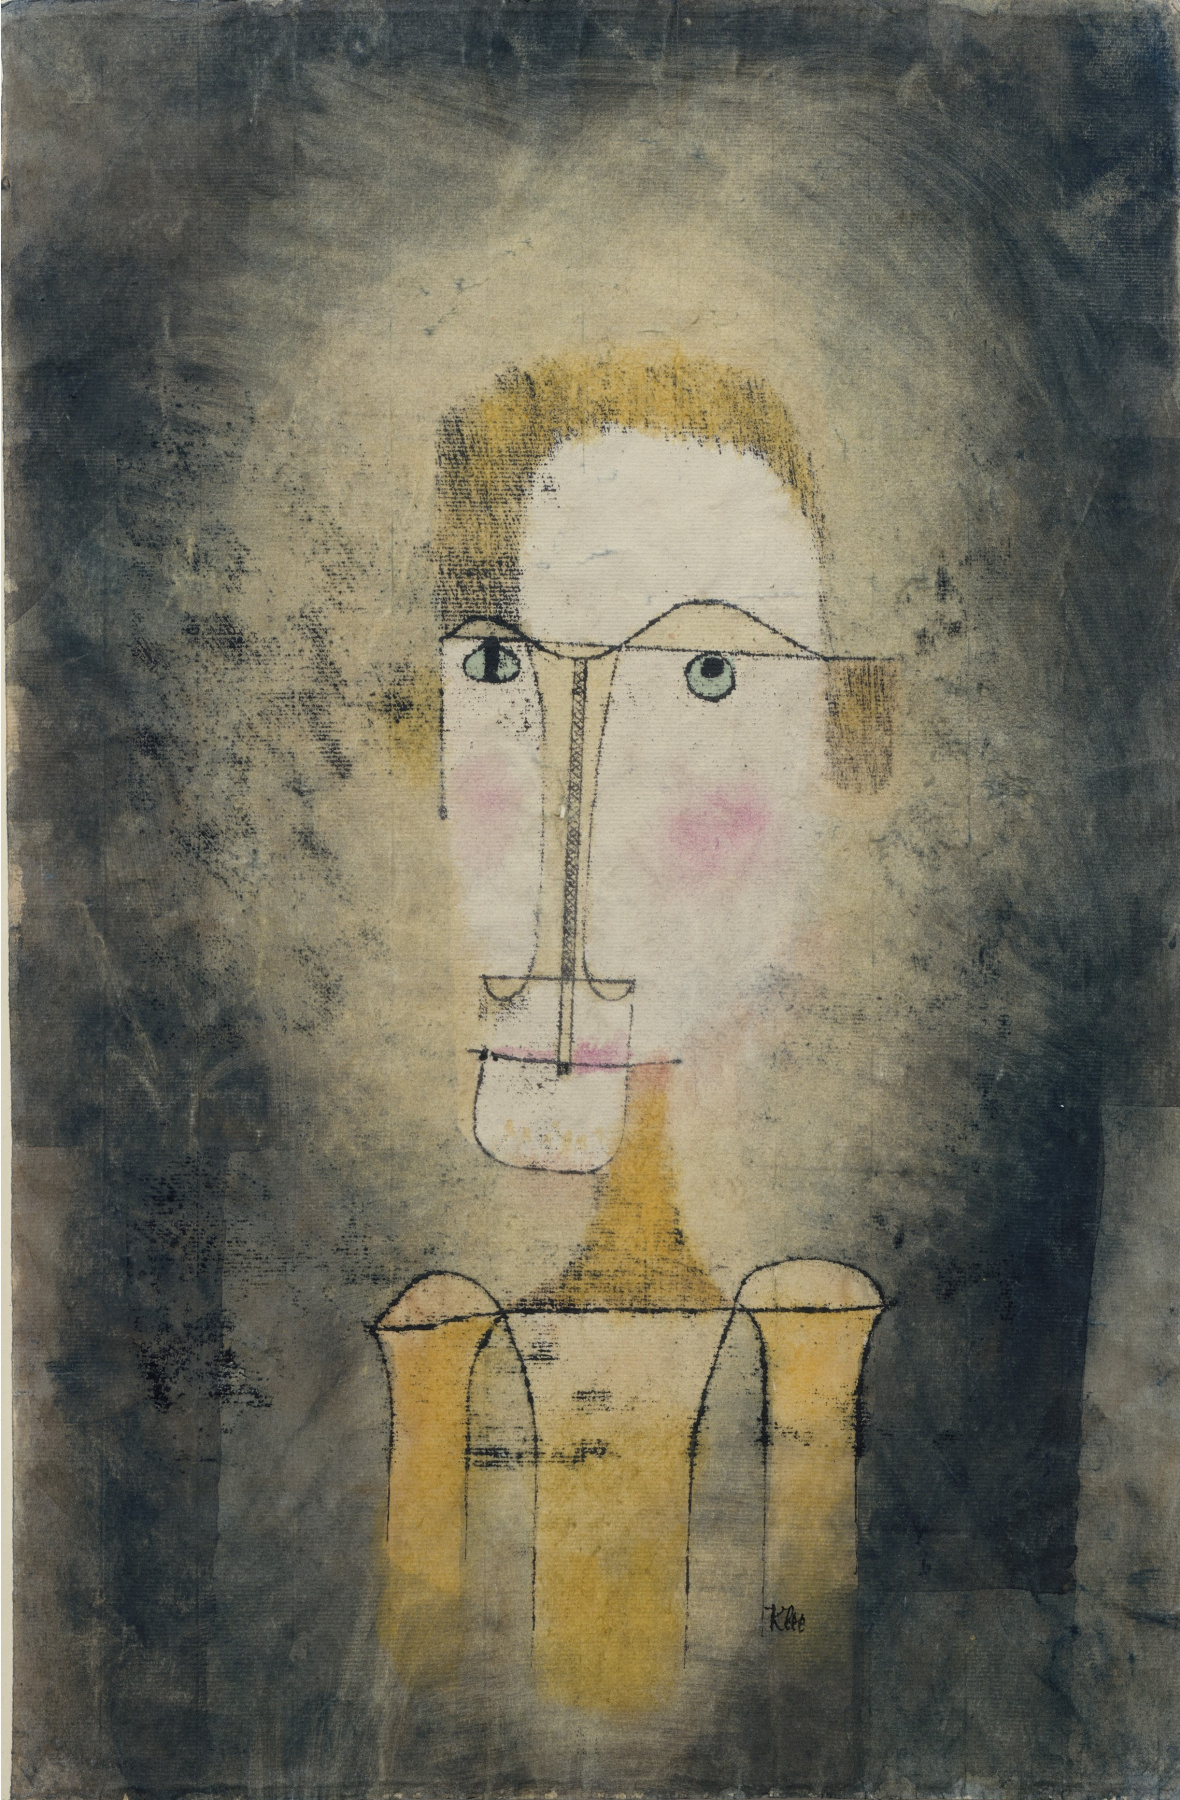 Paul Klee. Portrait of a yellow man